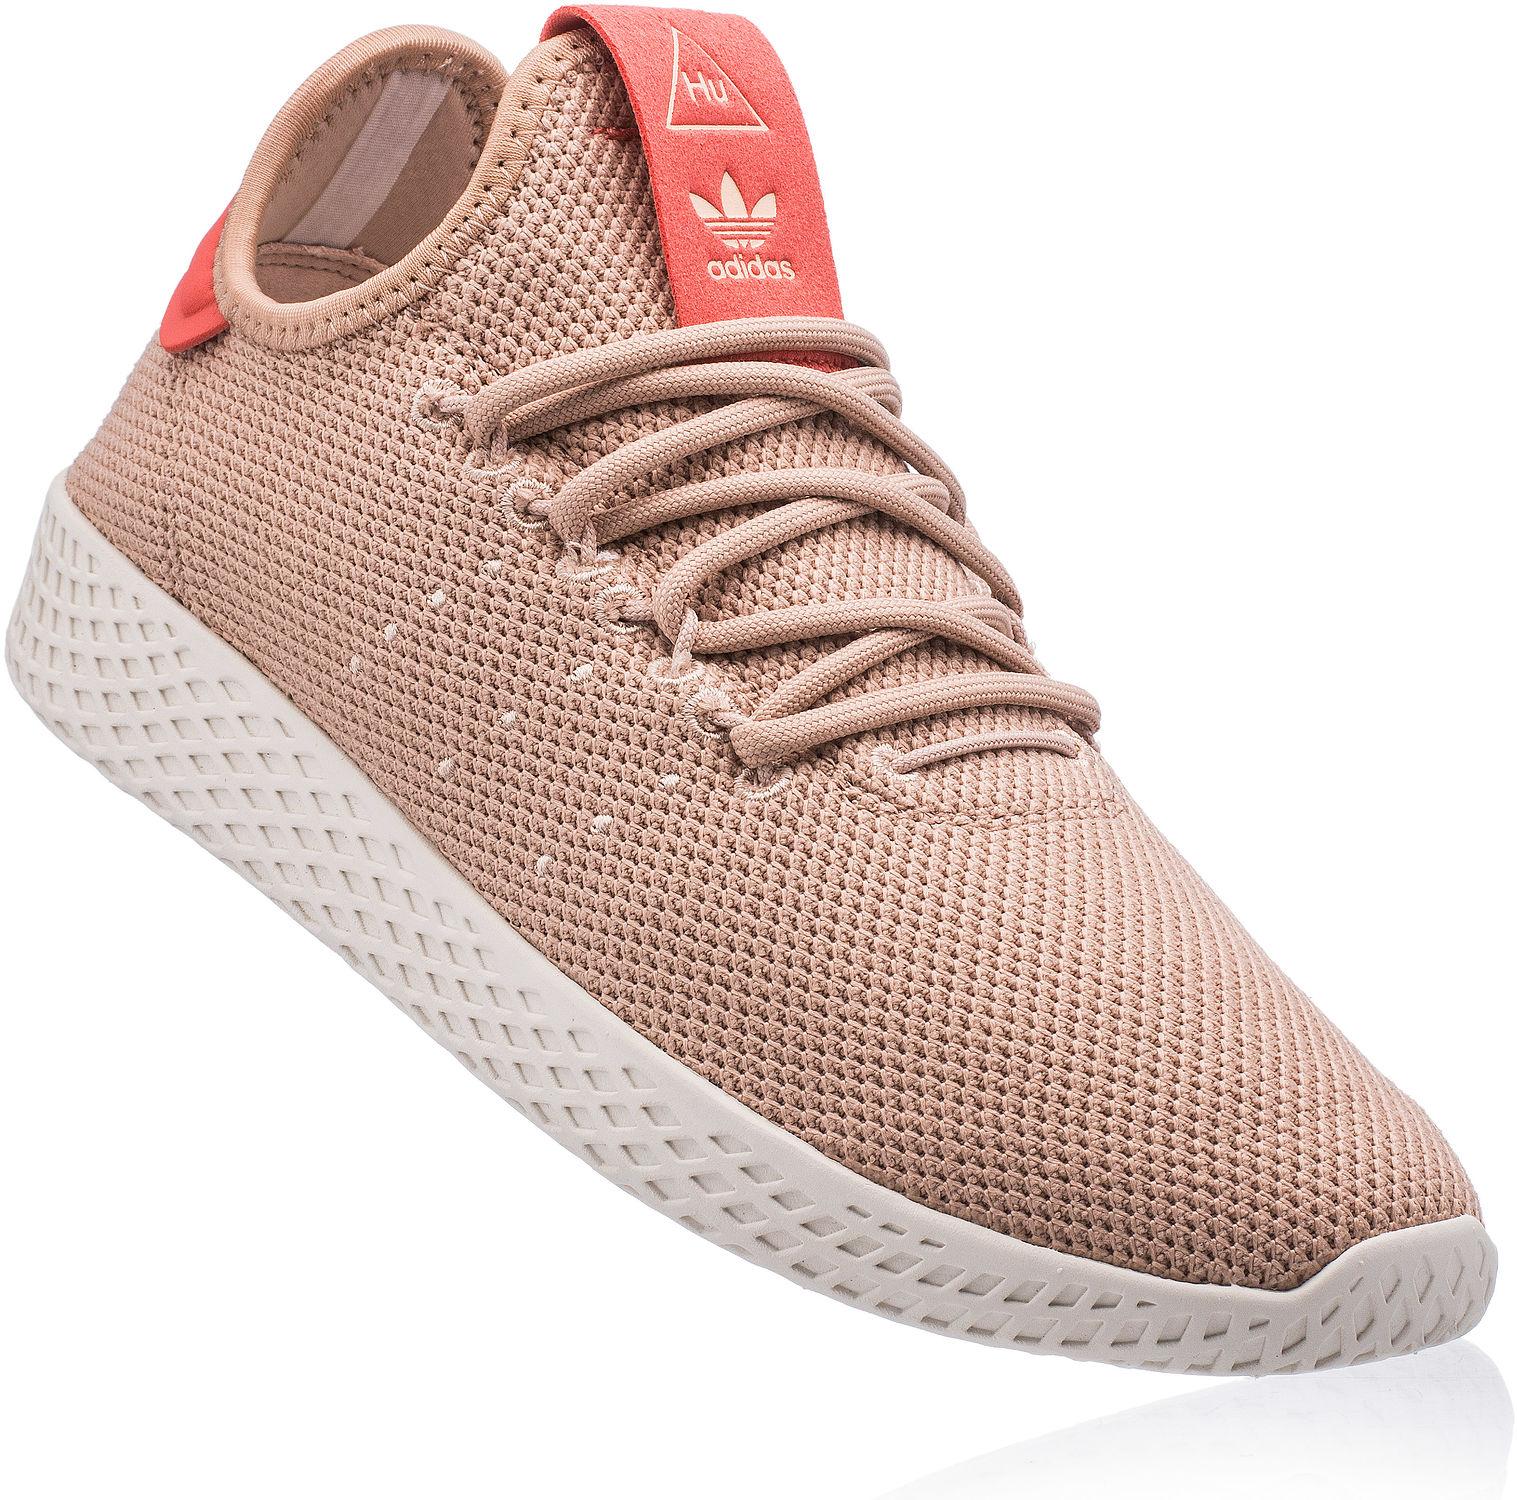 Męskie buty Adidas Pharrell Williams Tennis Hu (8 kolorów)